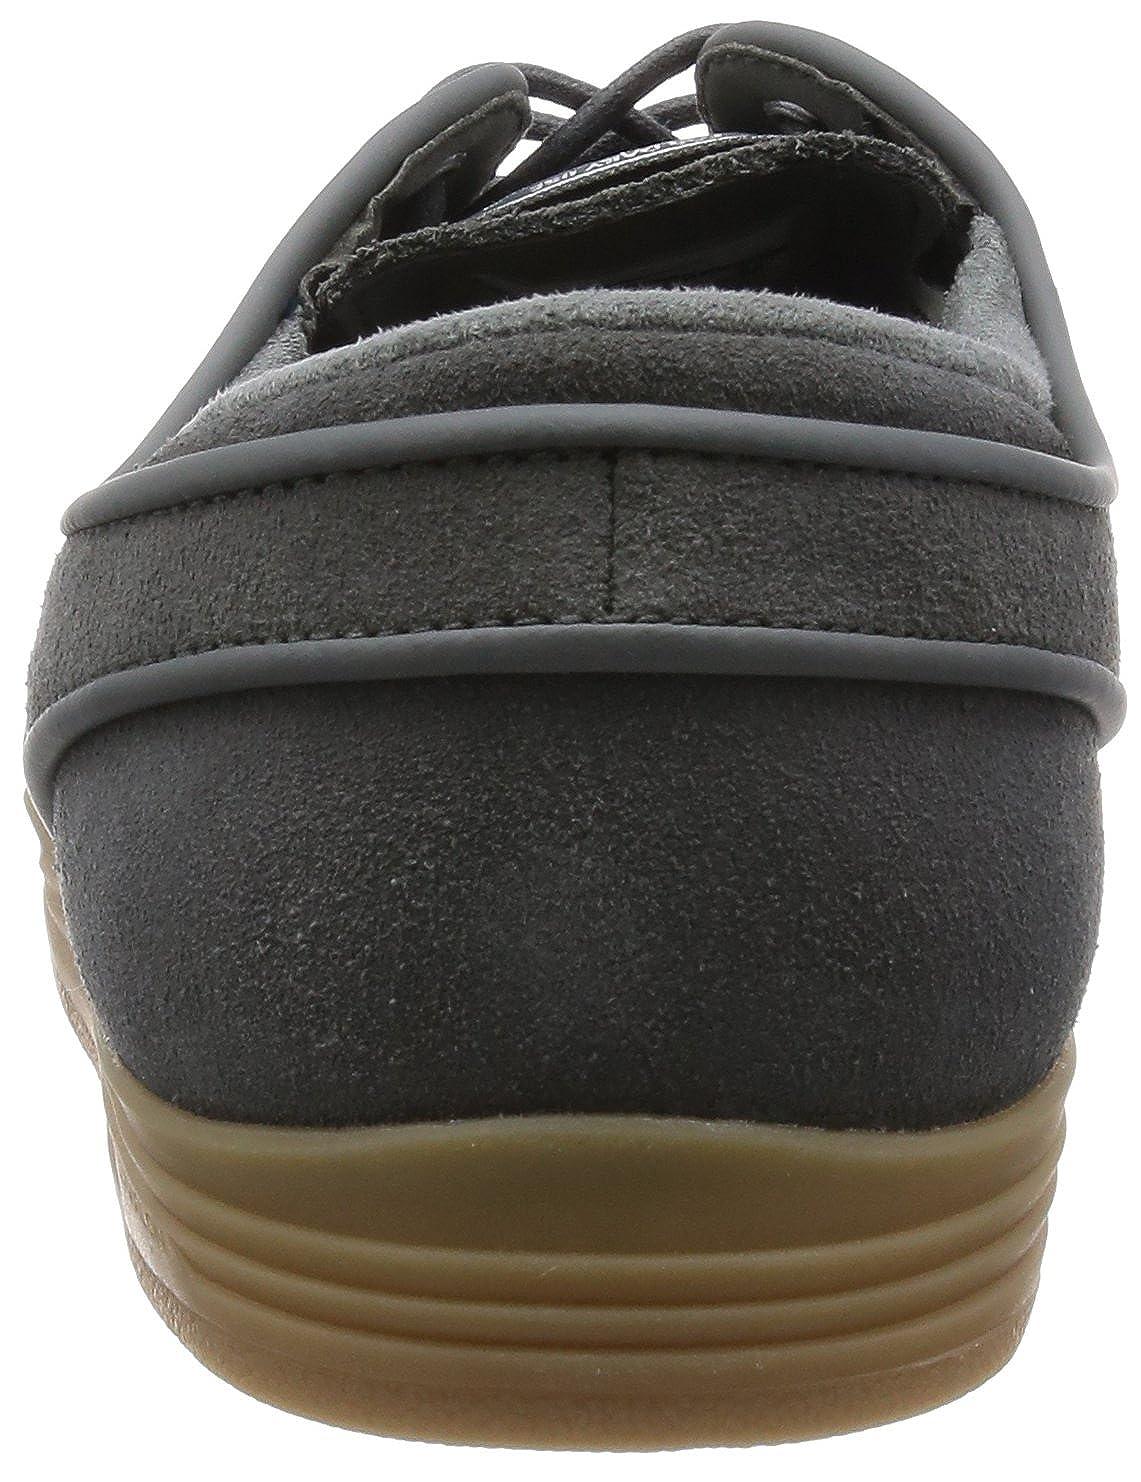 sports shoes 675ee 5a0dc Amazon.com   Nike SB Lunar Stefan Janoski River Rock Gum Light Brown Sail  Skate Shoes-9.5   Skateboarding